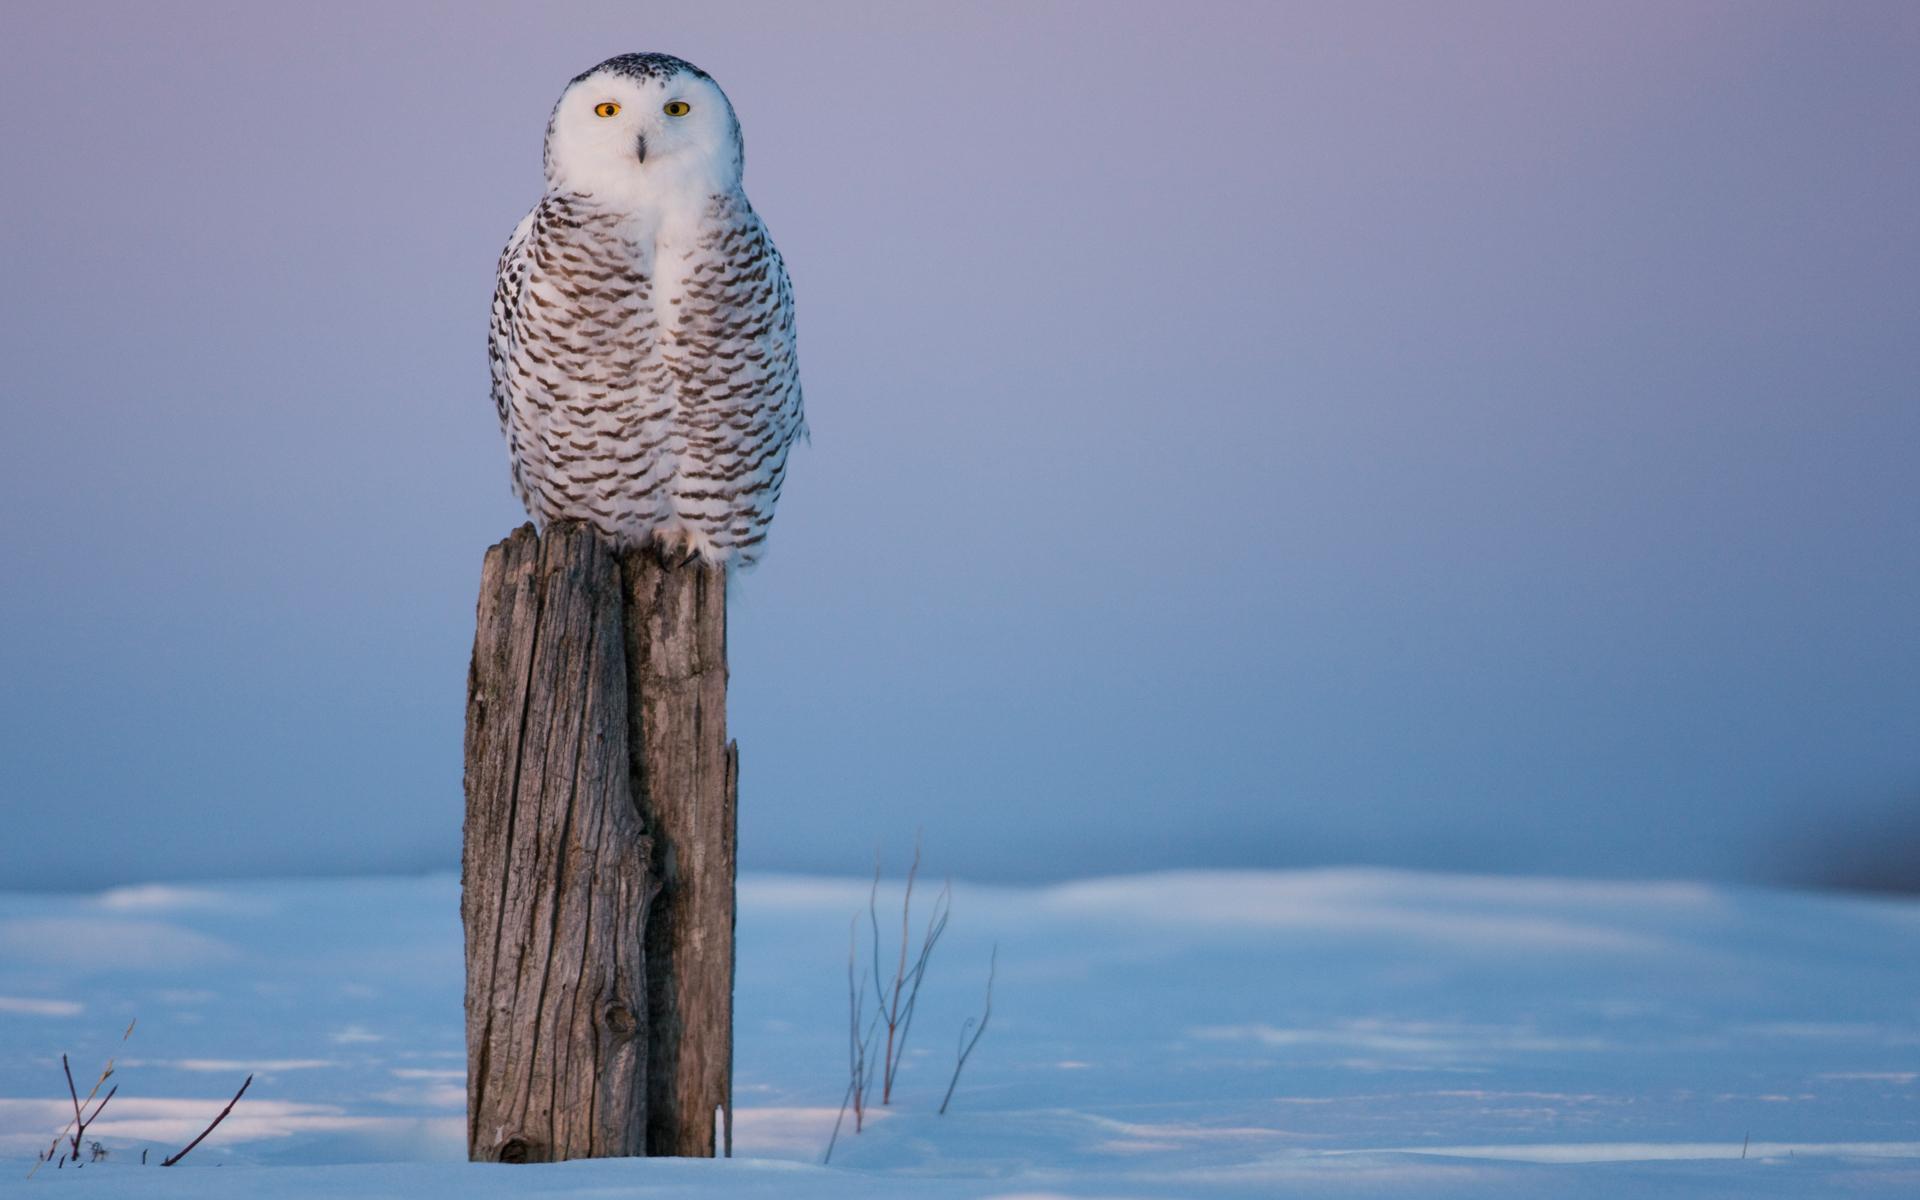 Snowy Owl Wallpaper Desktop Backgrounds For Dell Laptop 2041412 Hd Wallpaper Backgrounds Download